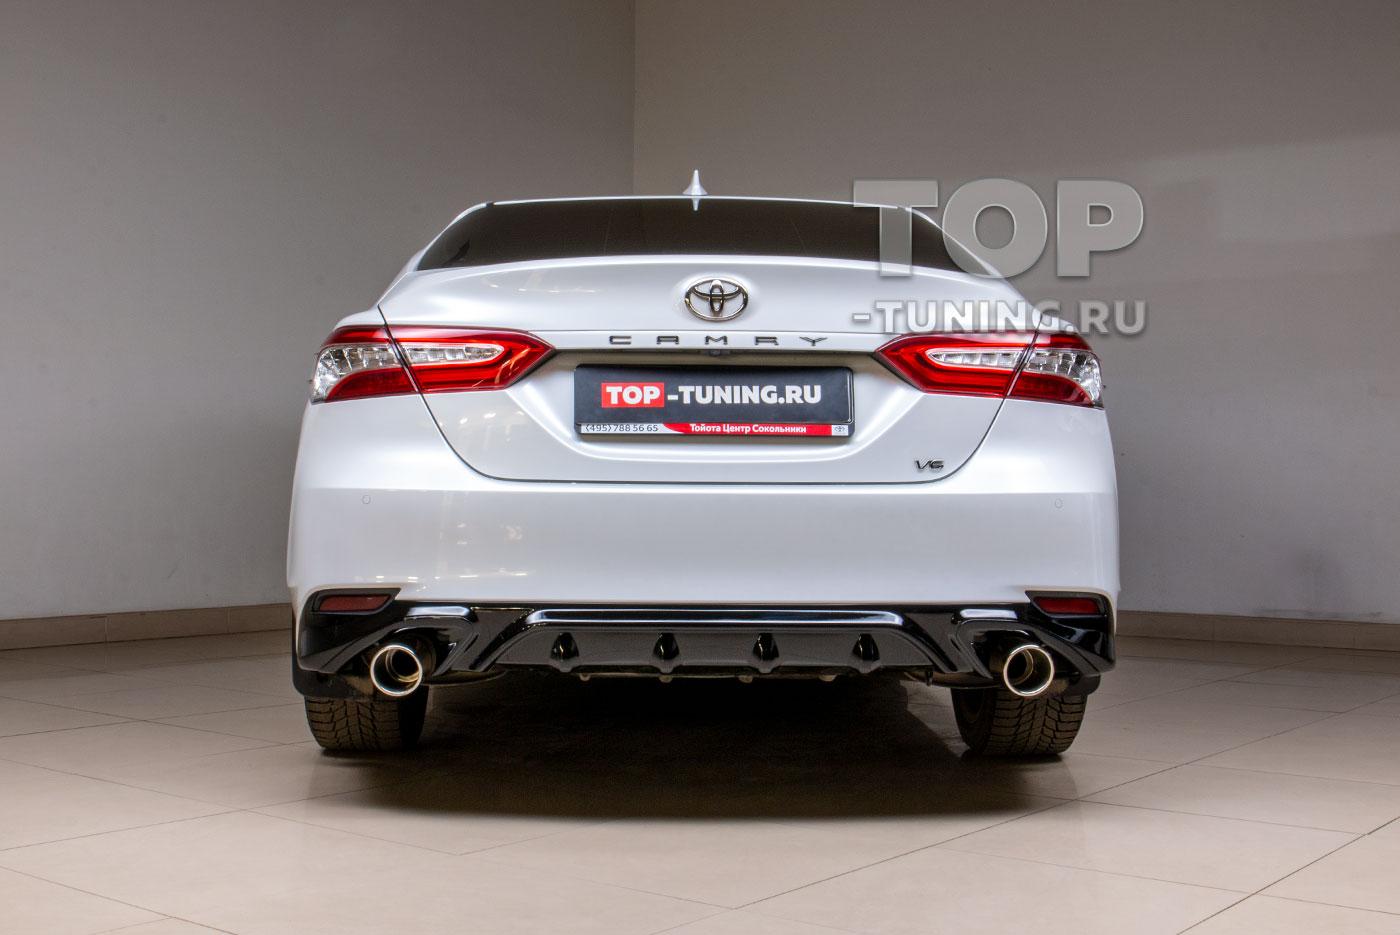 Диффузор Consul на задний бампер для Toyota Camry 3.5 XV70